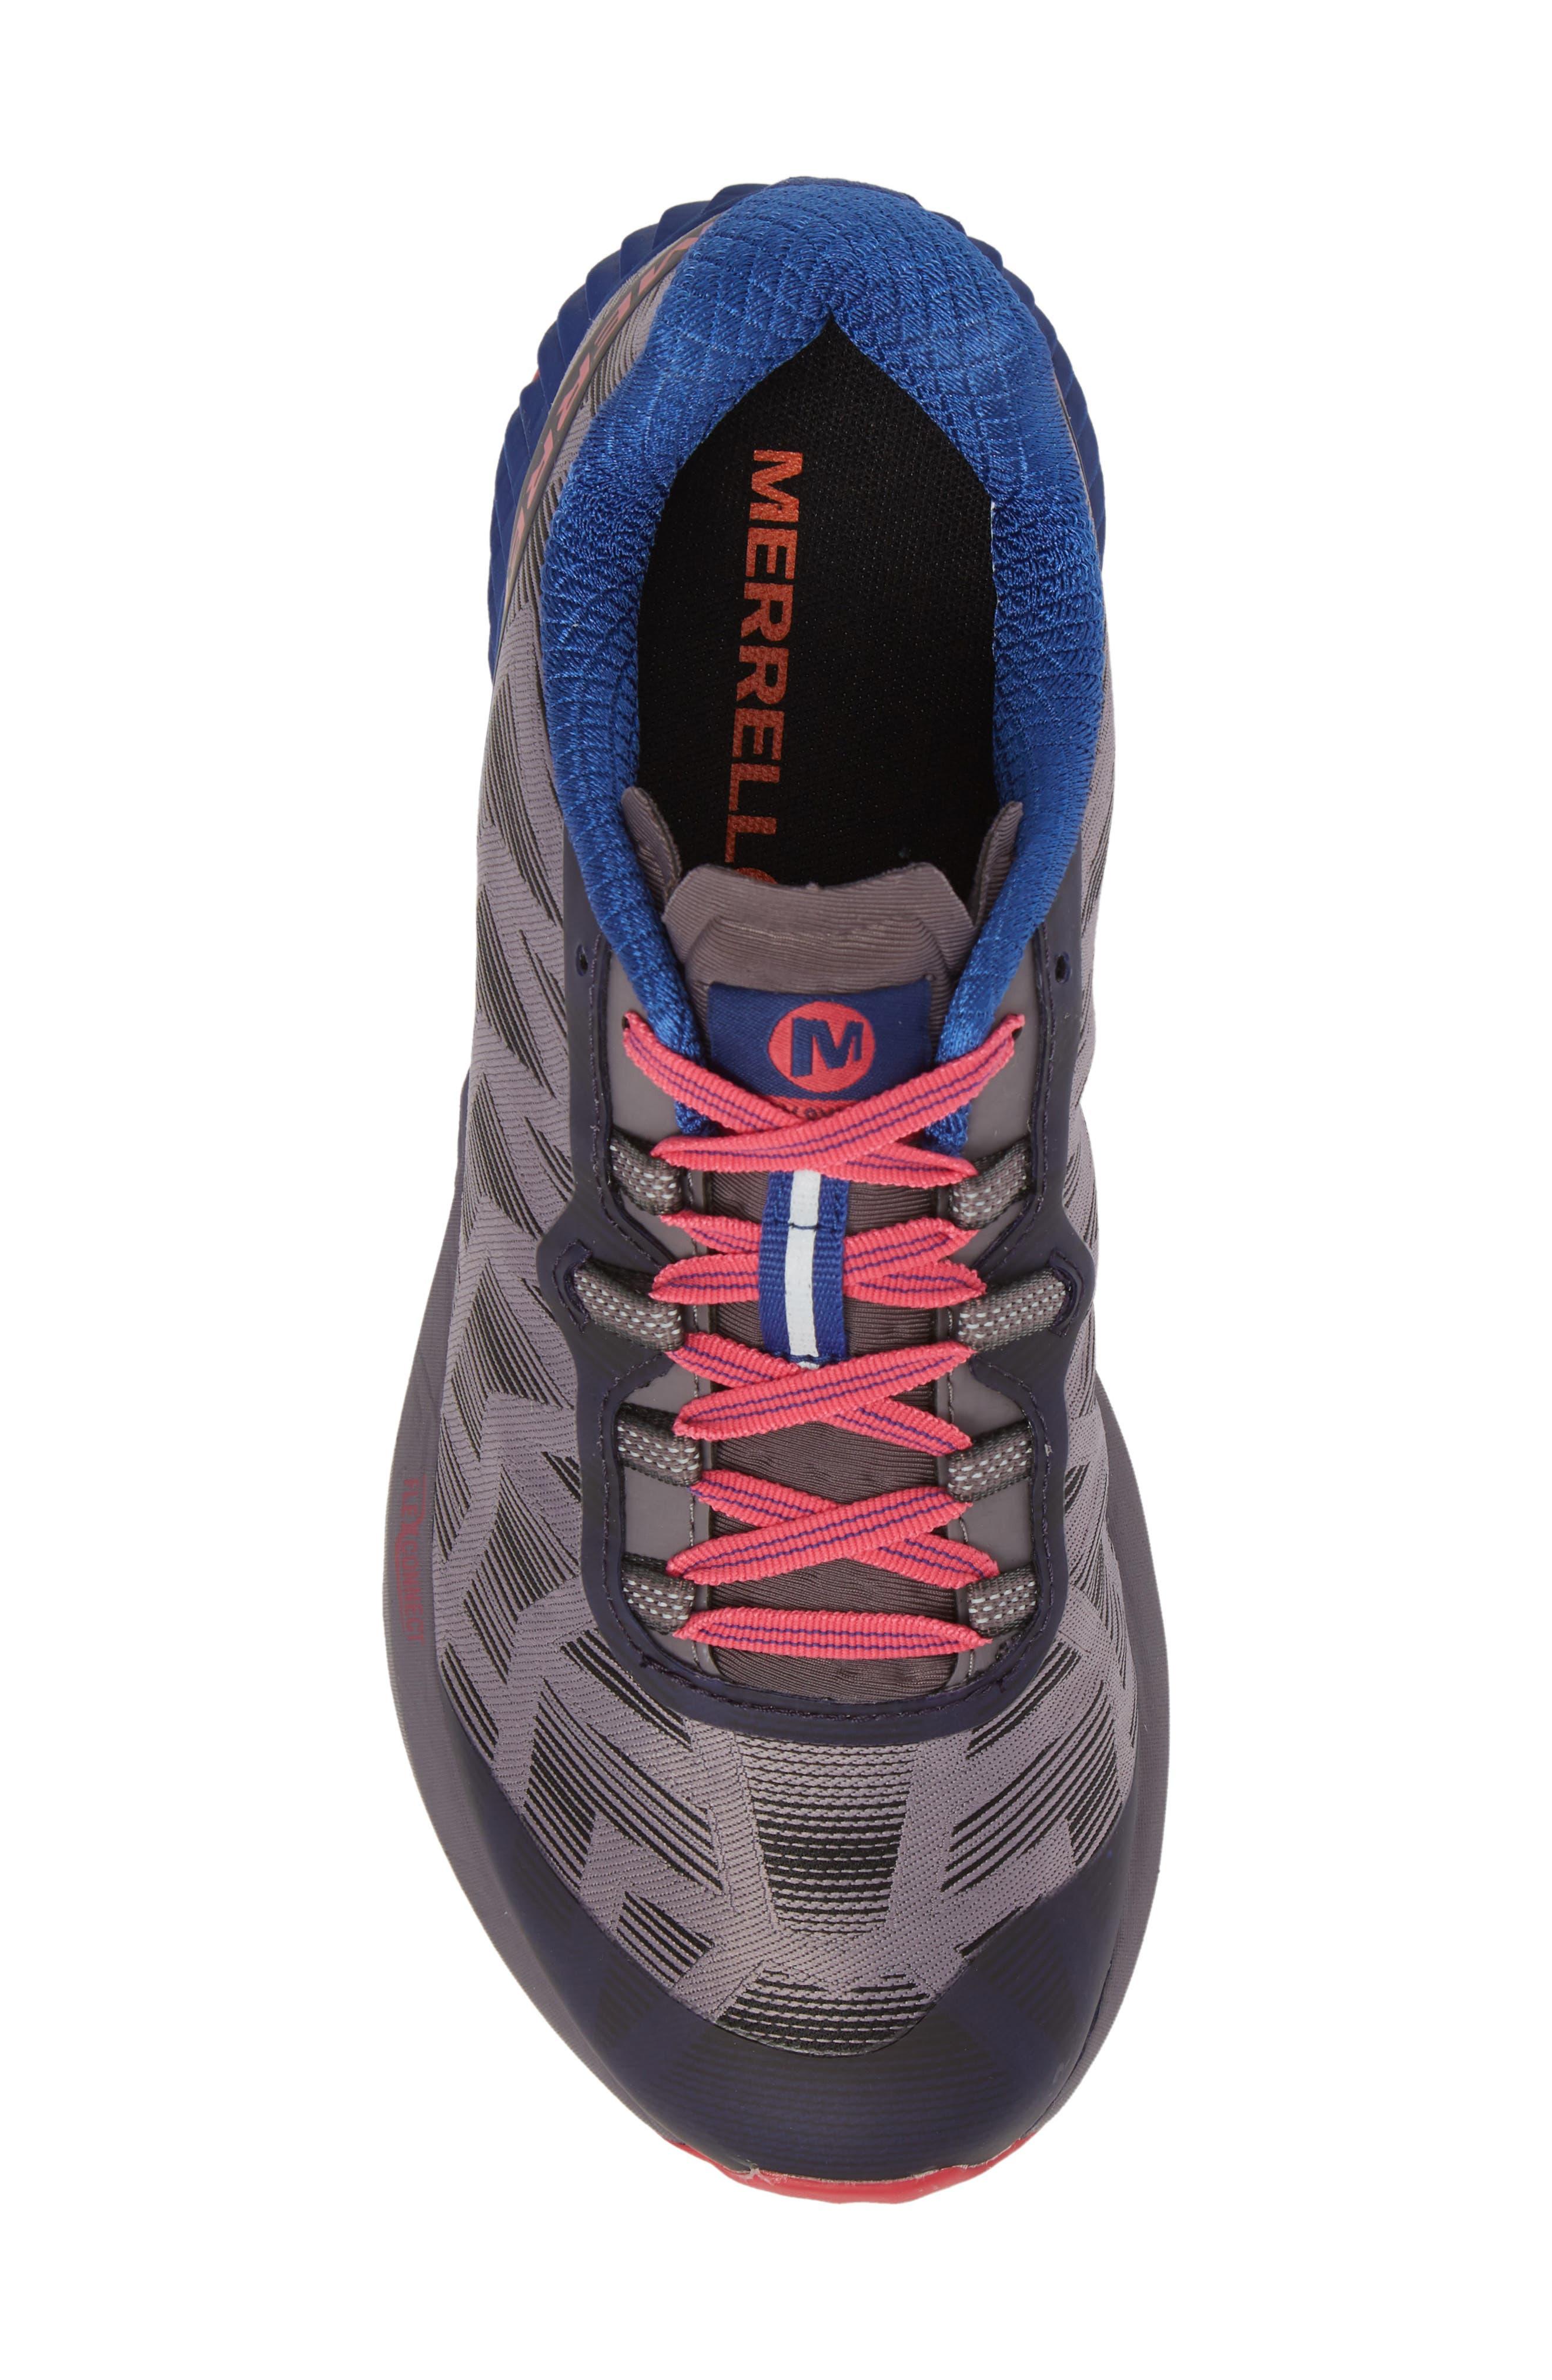 Agility Synthesis Flex Sneaker,                             Alternate thumbnail 5, color,                             SHARK FABRIC